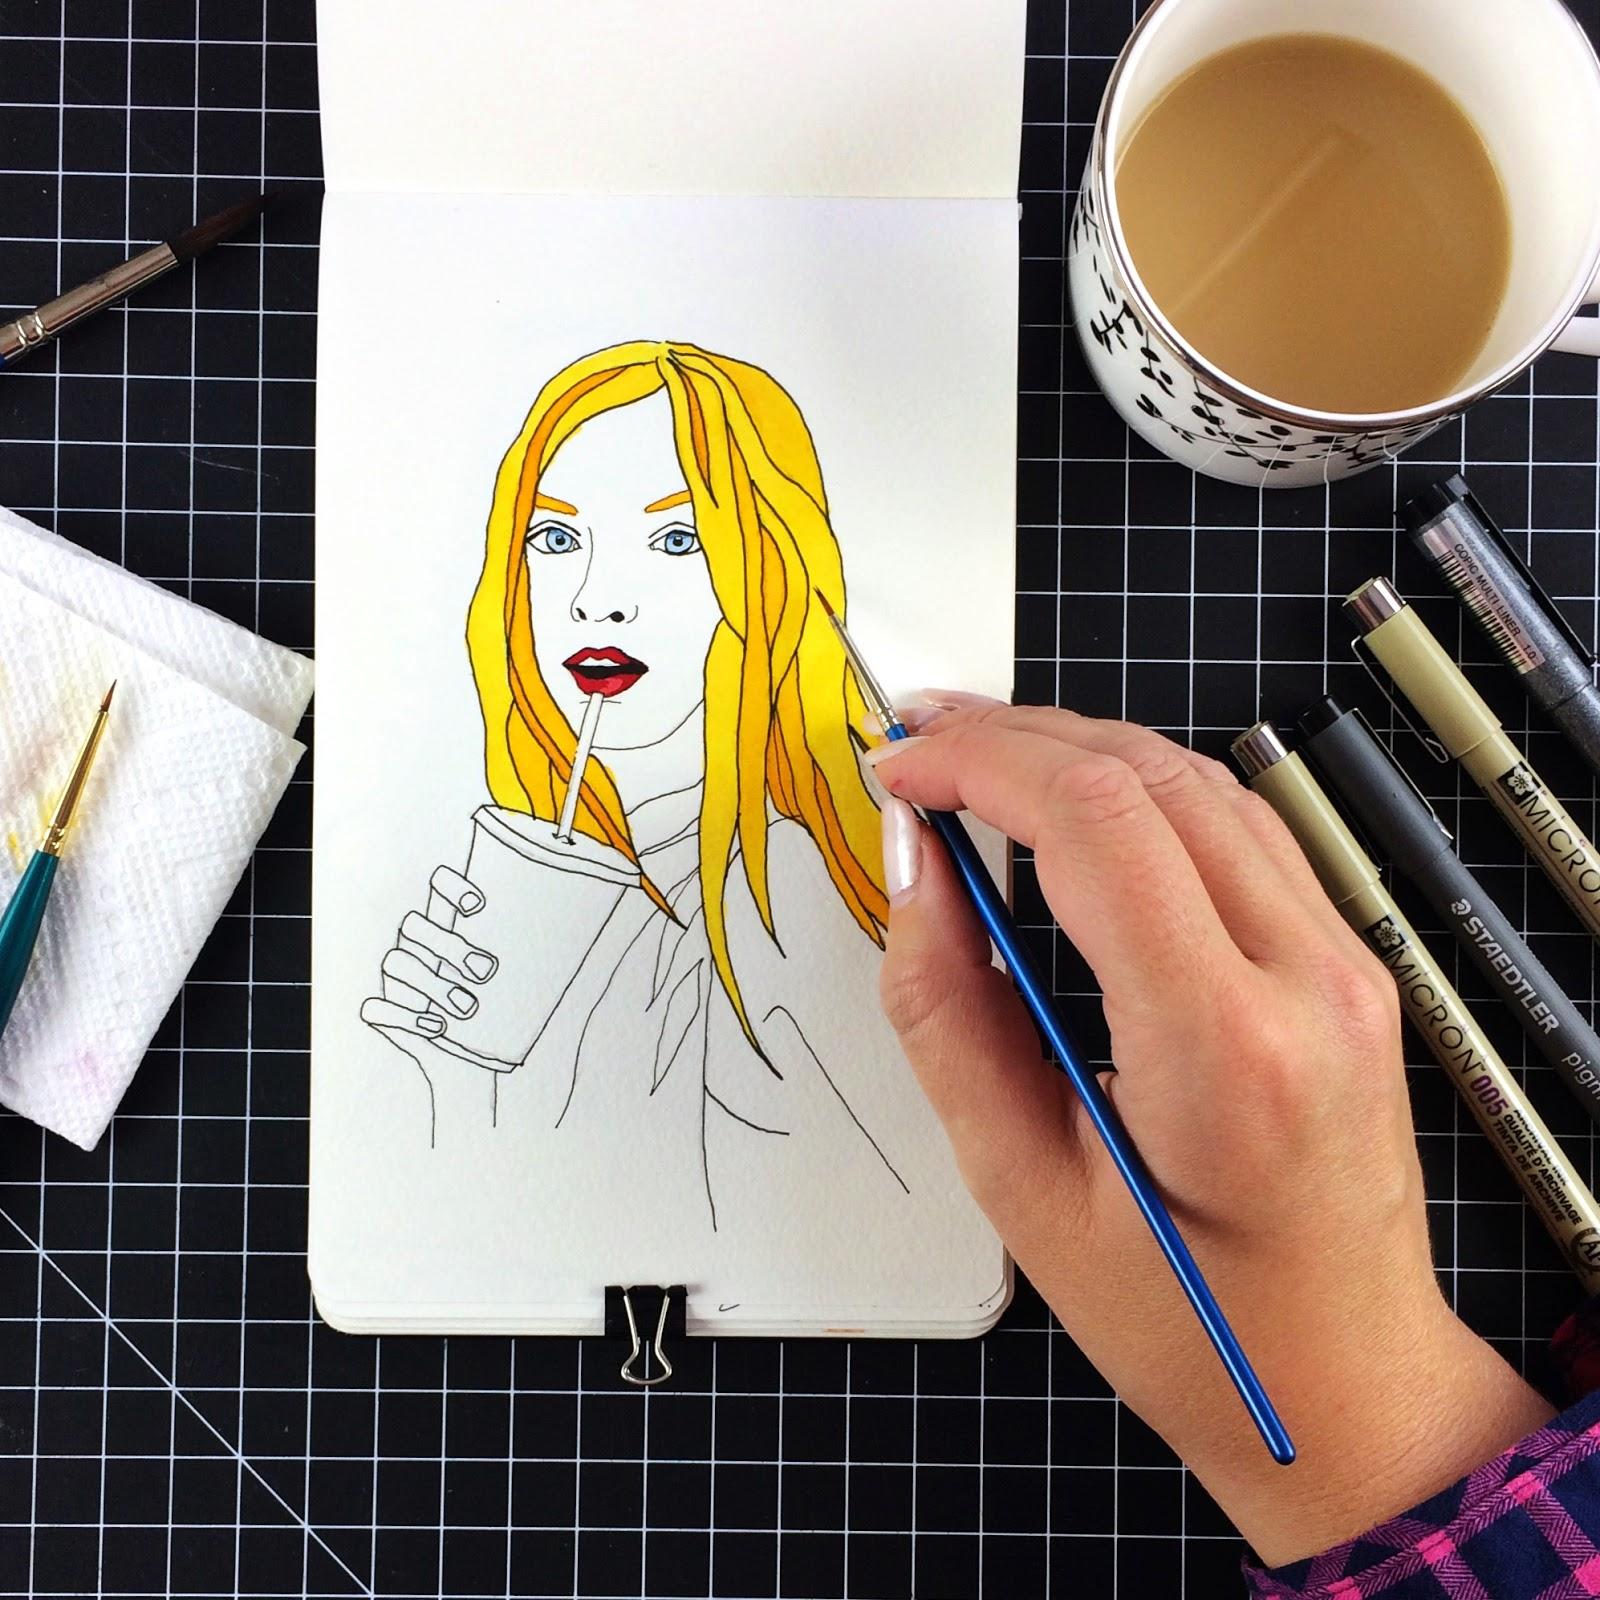 Inktober fashion illustration of Eva Staudinger by Jessica Mack aka BrownPaperBunny